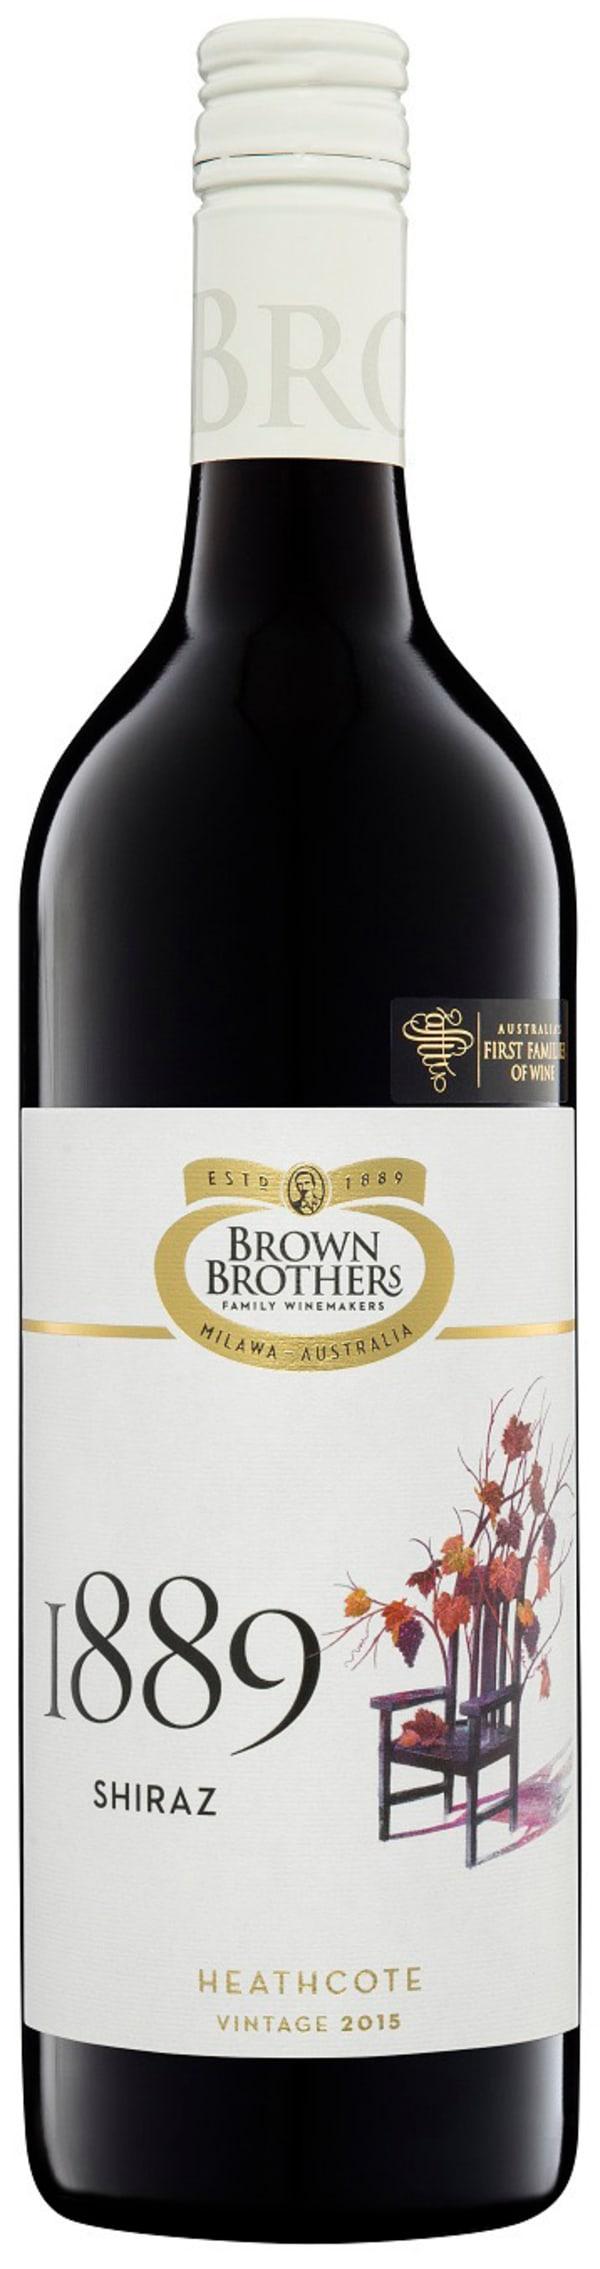 Brown Brothers Shiraz 2015